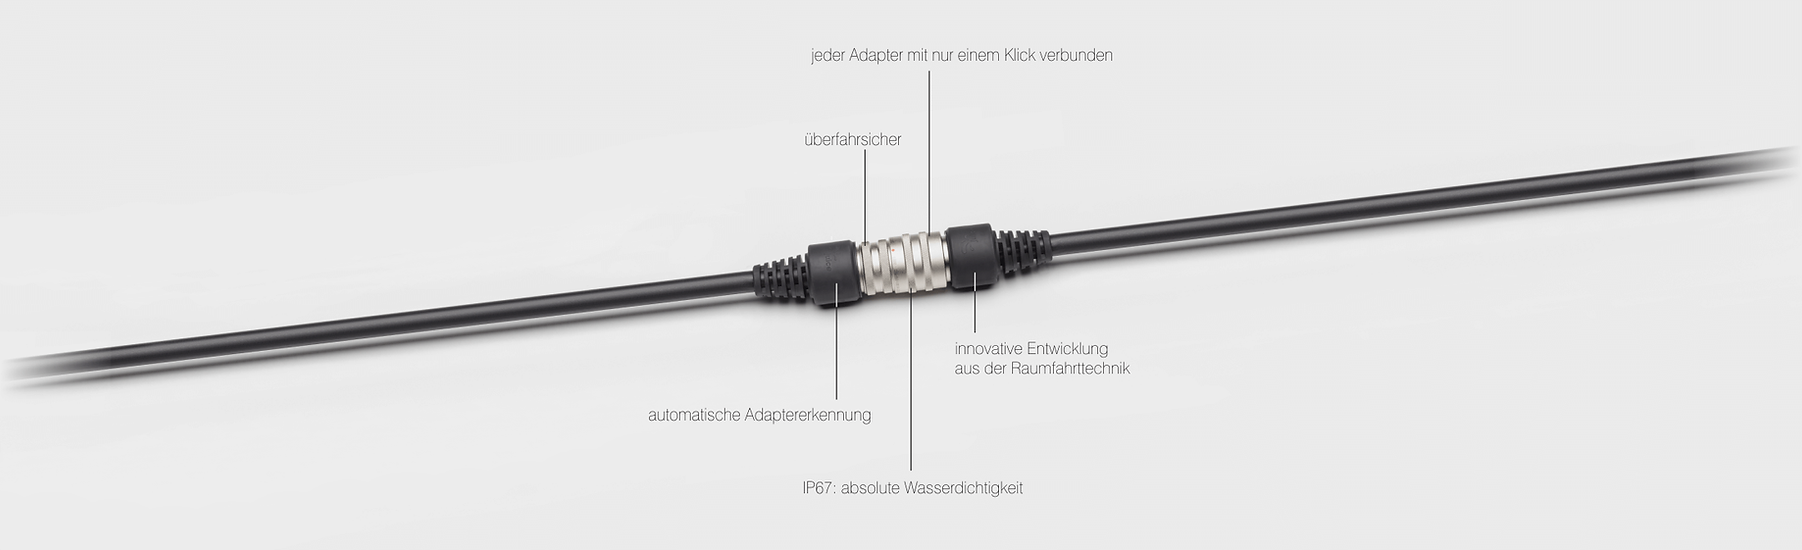 Eigenschaften des JUICE CONNECTOR (ICCB) (ICCPD) Elektroauto Ladekabel Ladestation